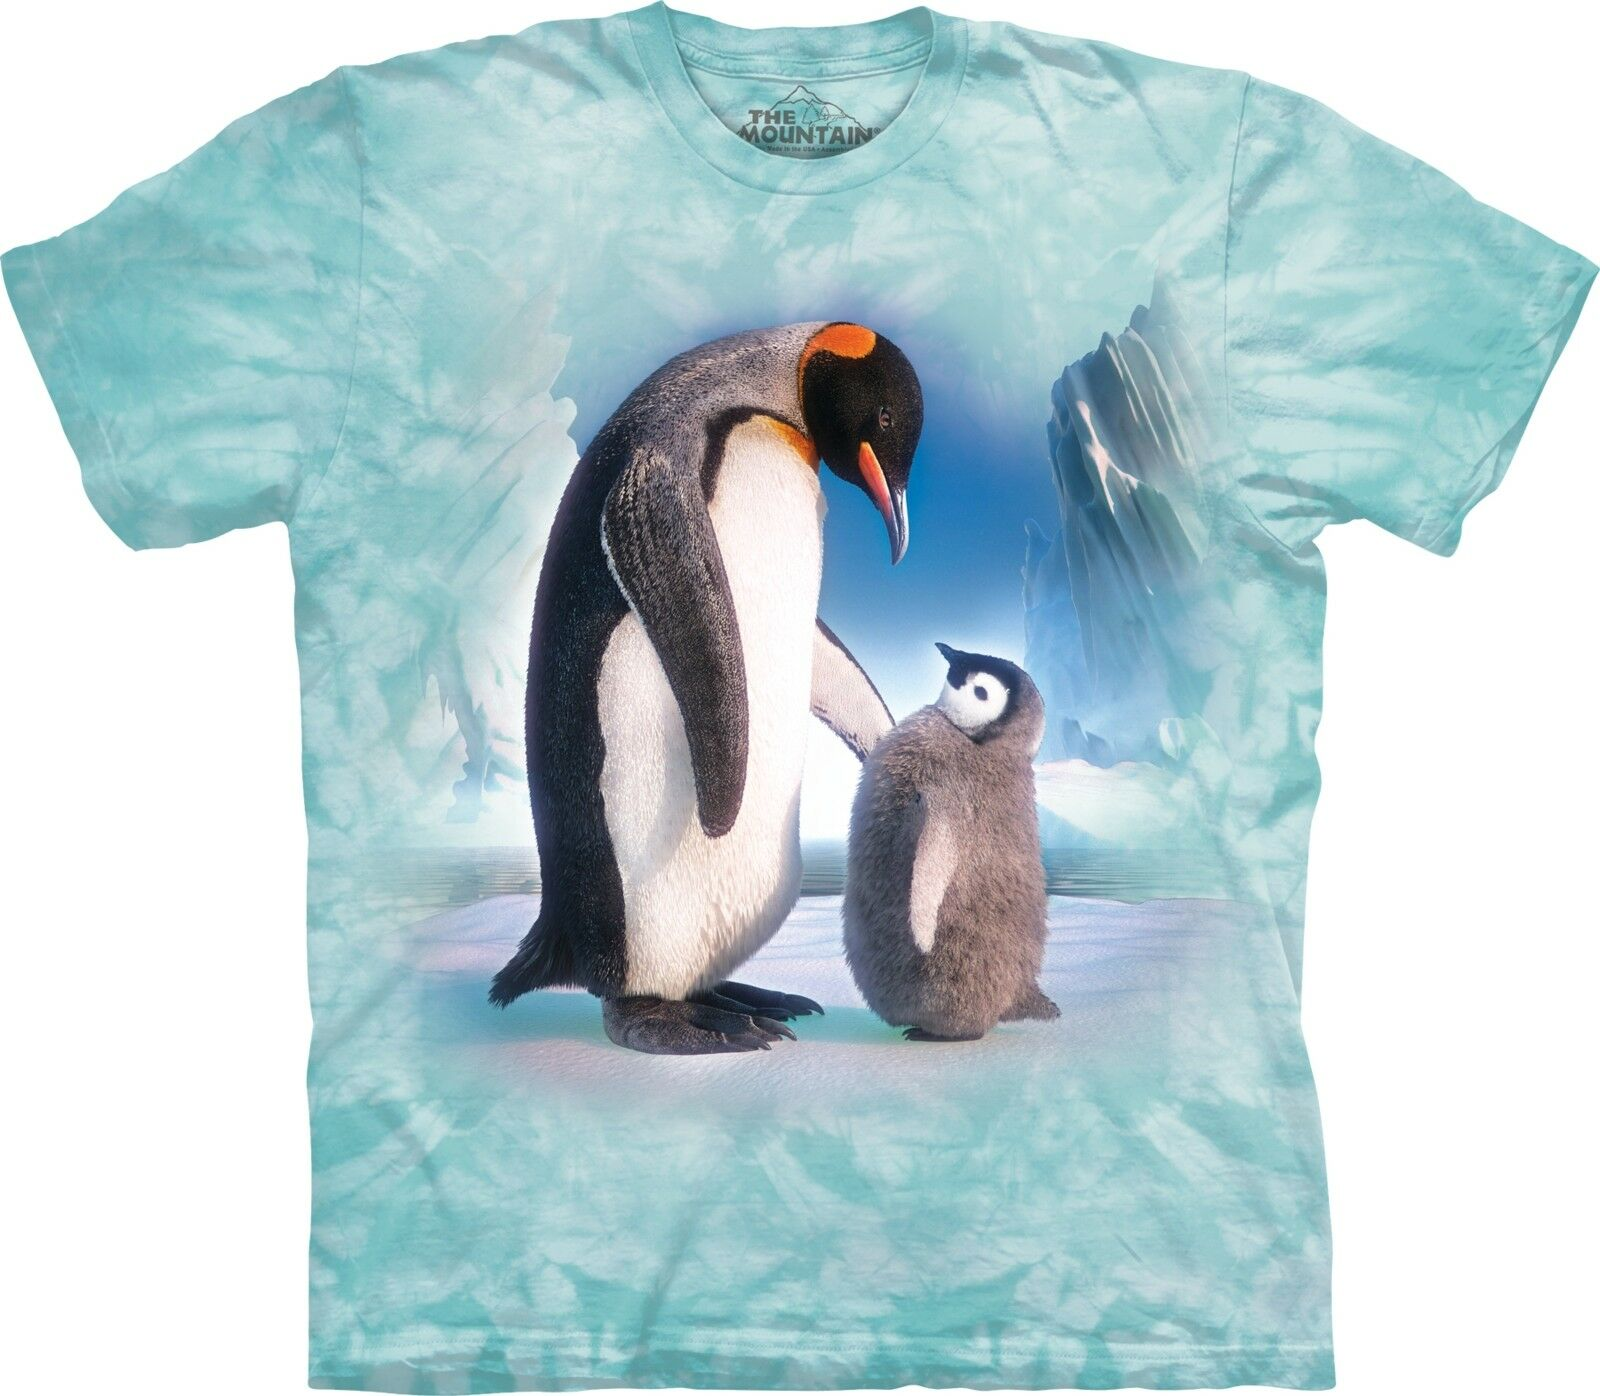 The Mountain Unisex Adult The Next Emperor Penguin T Shirt